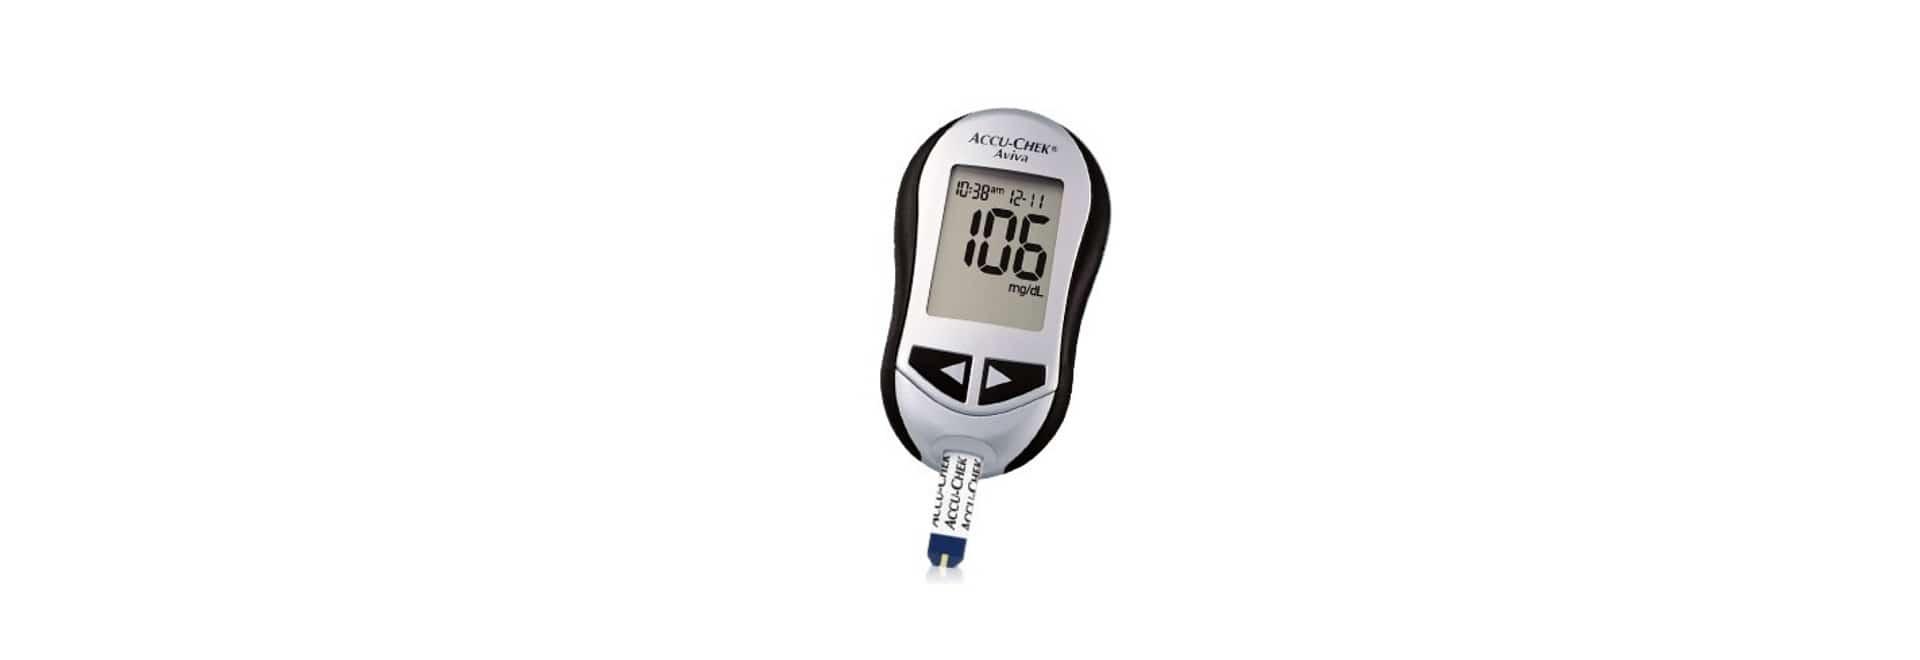 ACCU-CHEK Aviva Blood Glucose Monitor